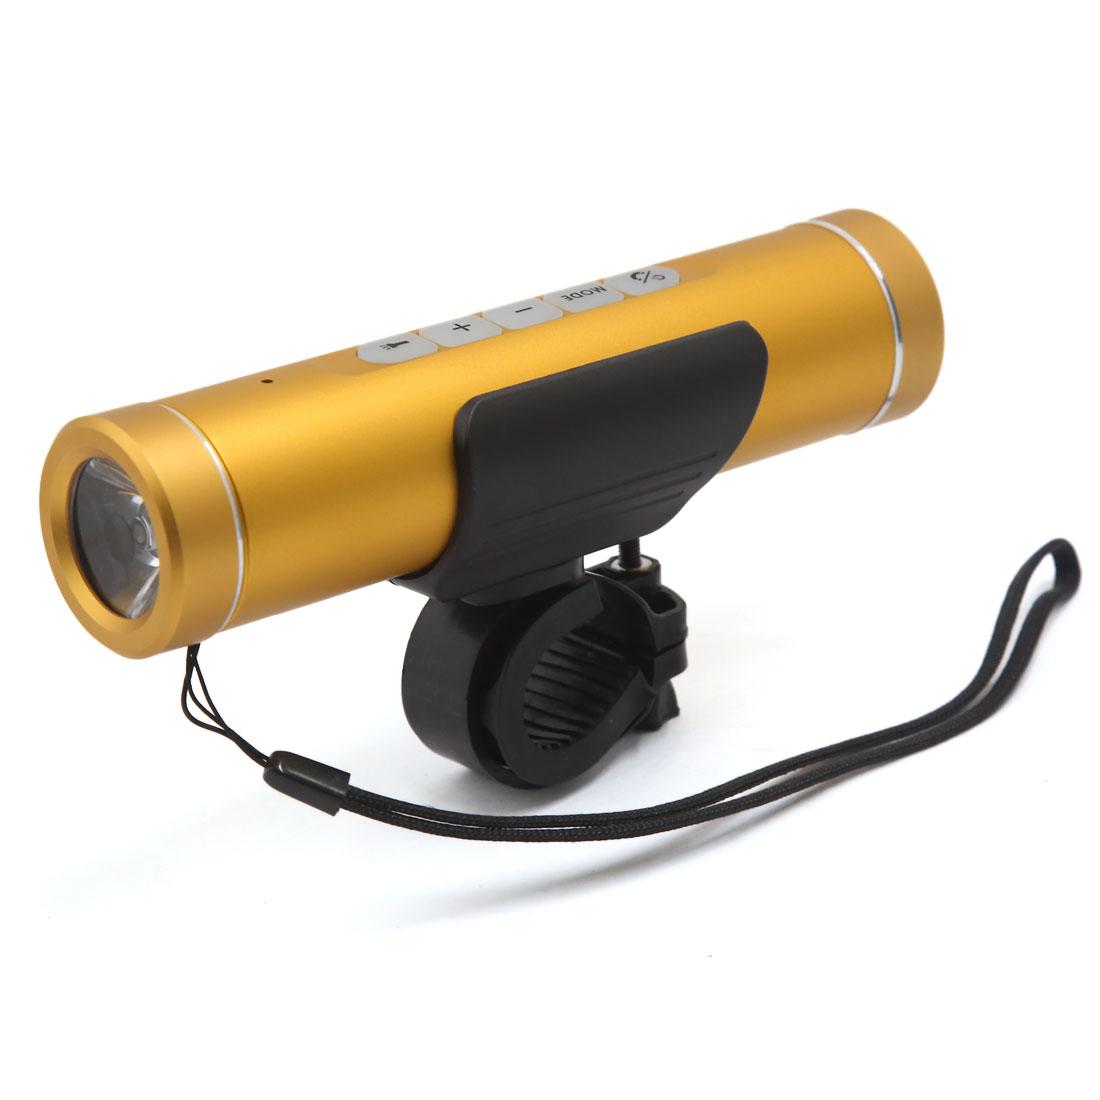 Multi-function Waterproof bluetooth Bike Music Flashlight Power Bank Gold Tone